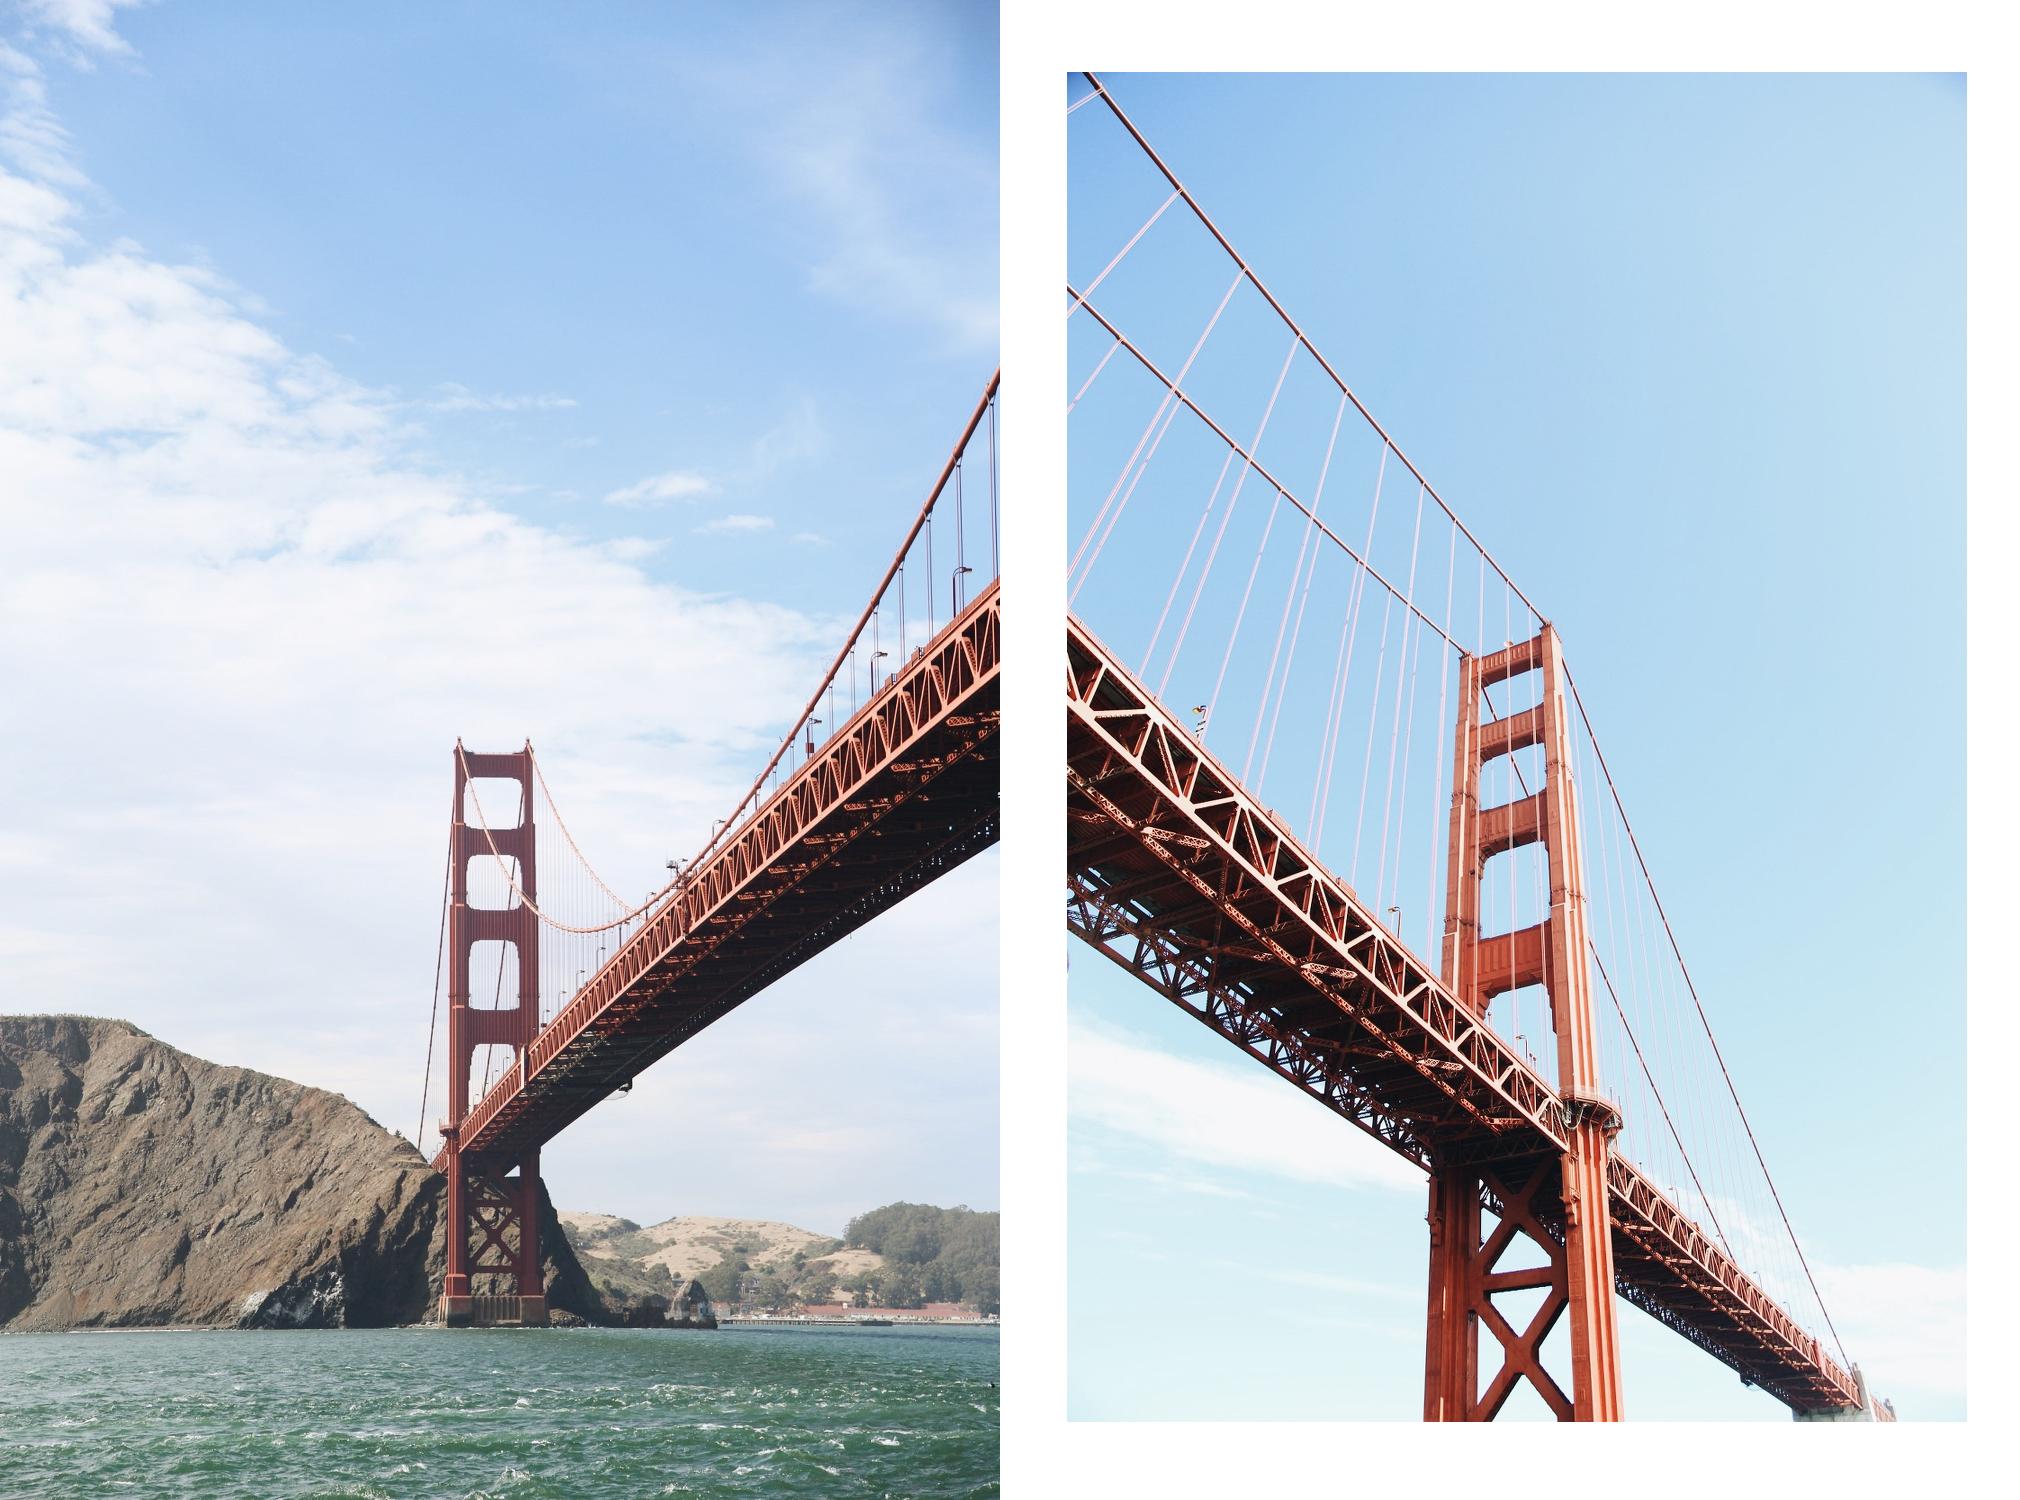 croisiere-baie-san-francisco-golden-gate-bridge.JPG